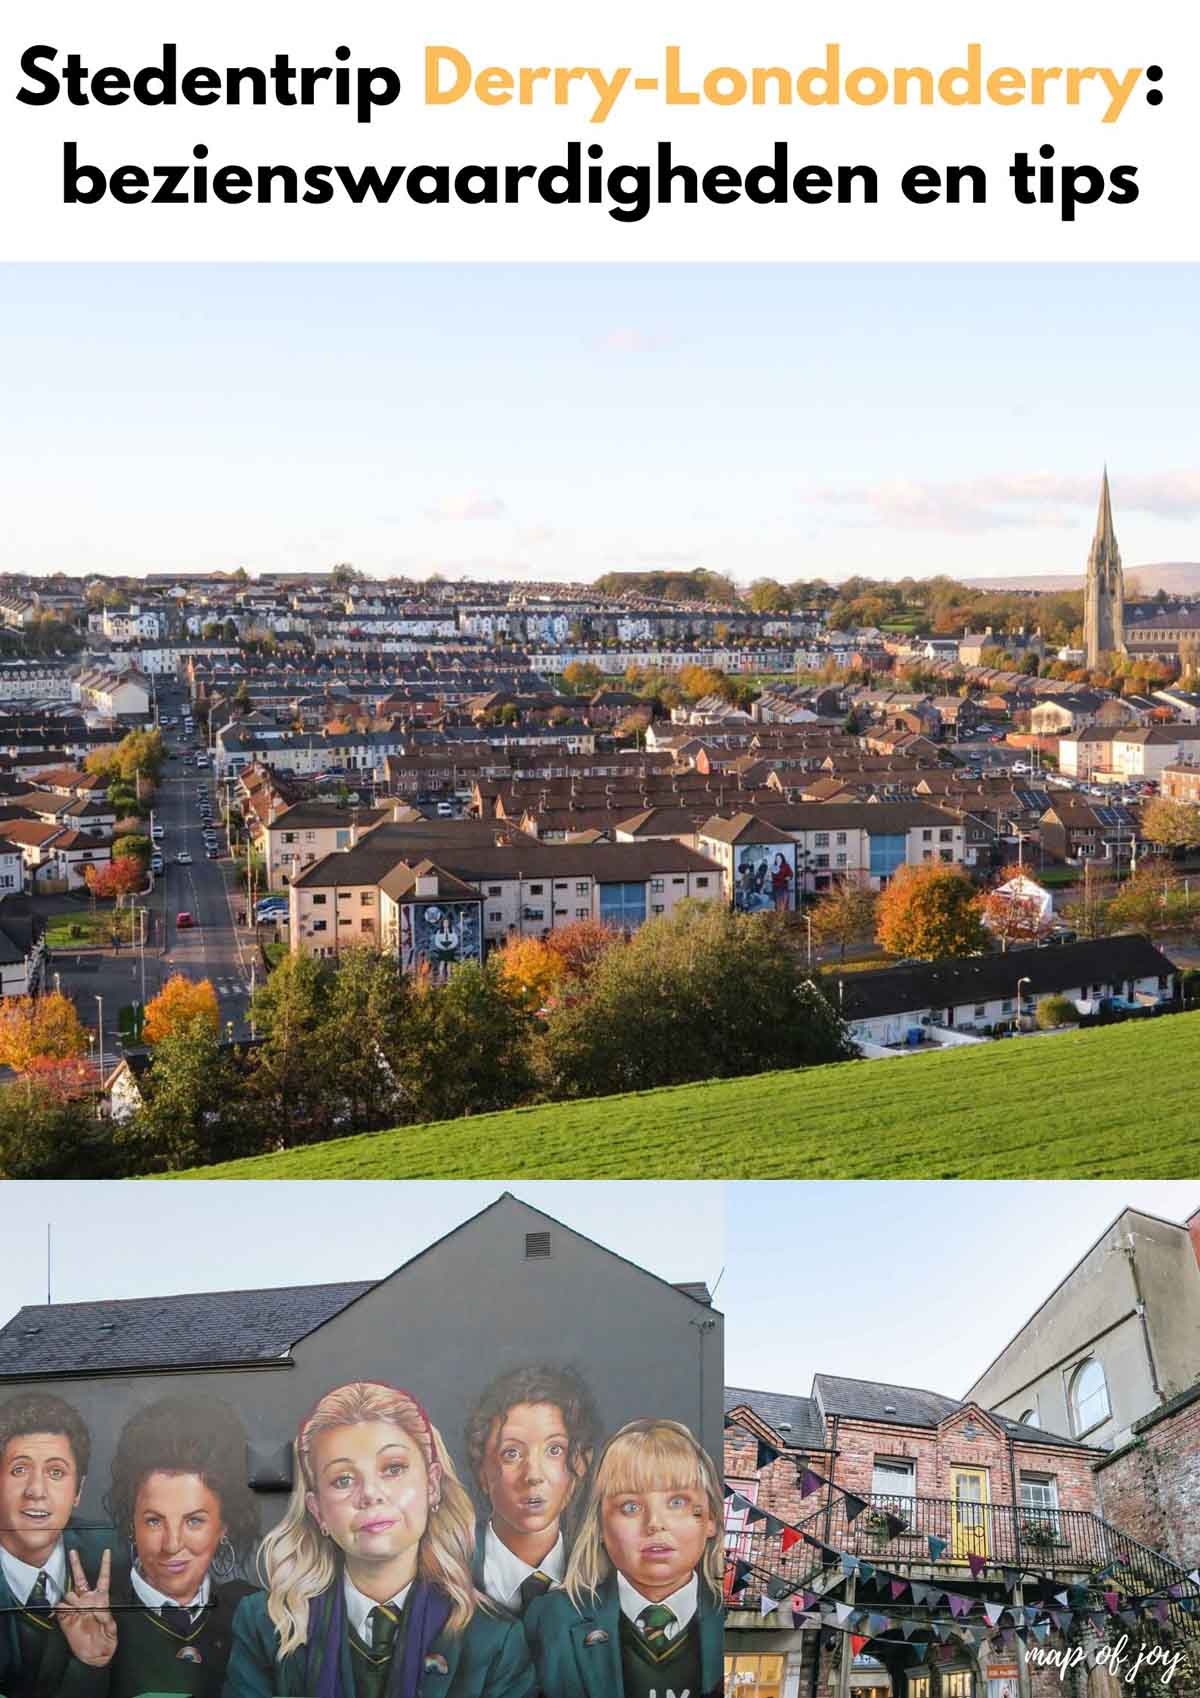 Stedentrip Derry-Londonderry: bezienswaardigheden en tips - Map of Joy